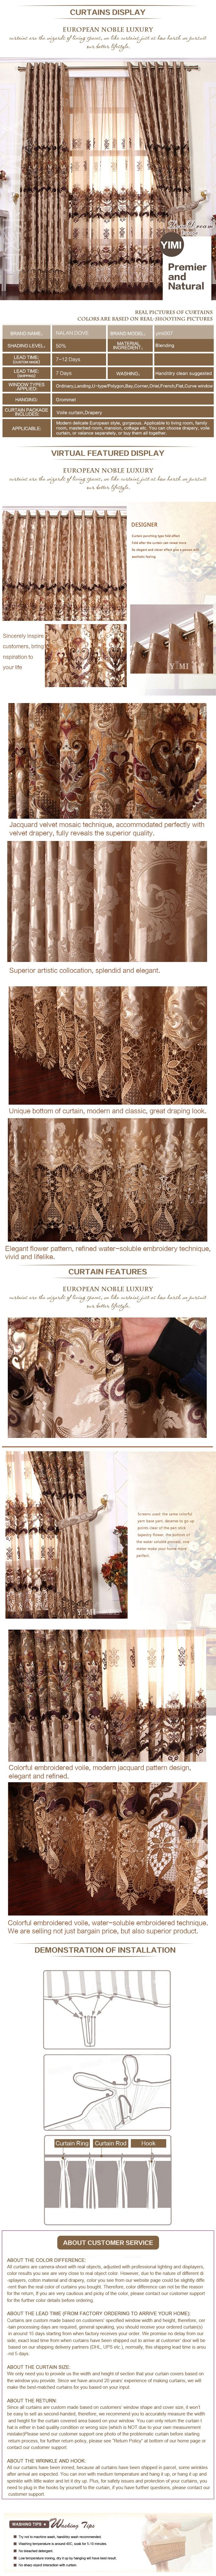 Luxury window curtain - Lanandoff $100  (60% off)